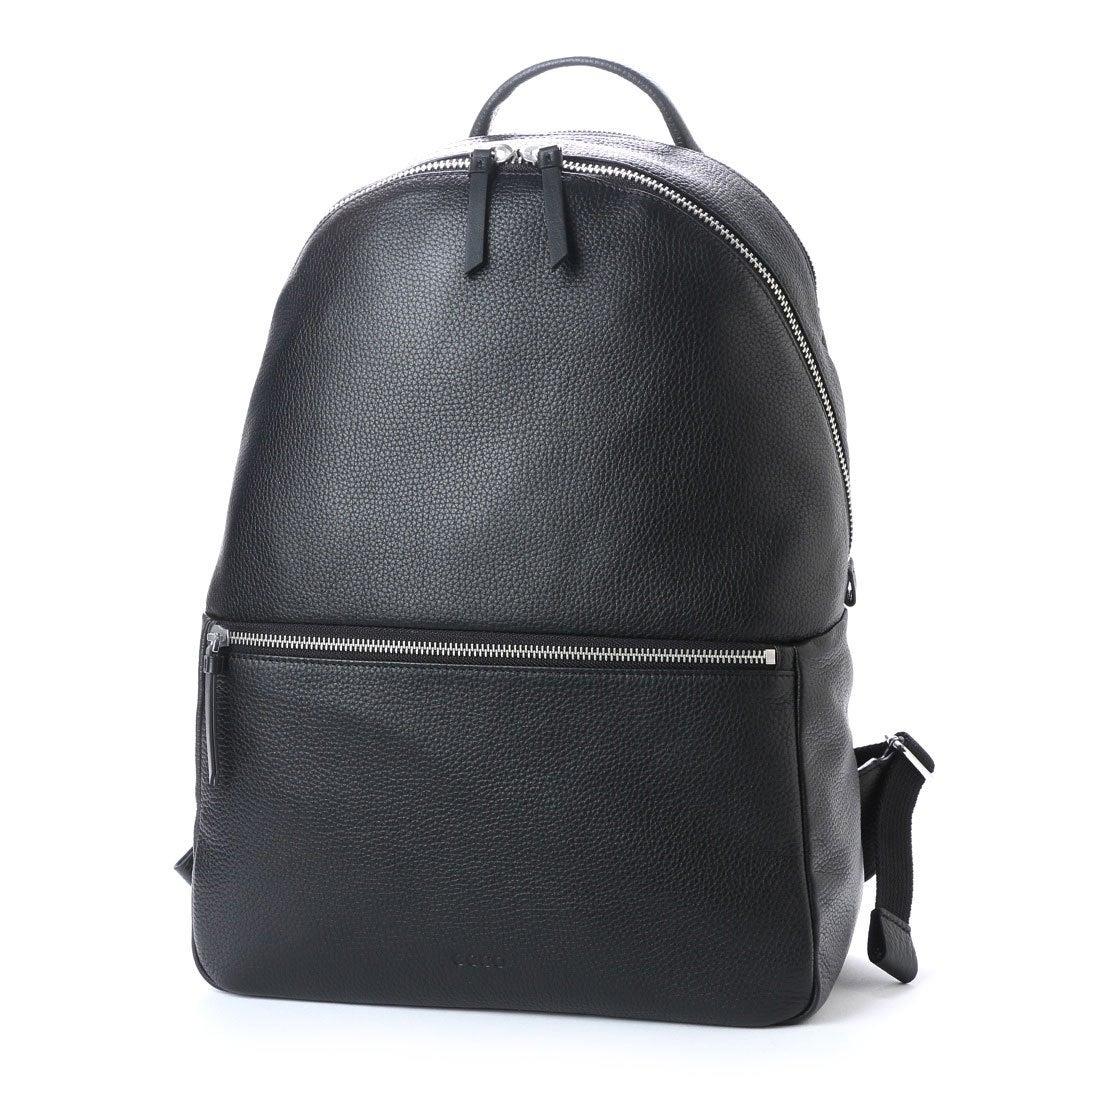 aa5e62396a33 エコー ECCO SP 3 Backpack 13inch (BLACK) -ラグジュアリーブランド通販 ロコンドデパートメント (LOCONDO  DEPARTMEMT)